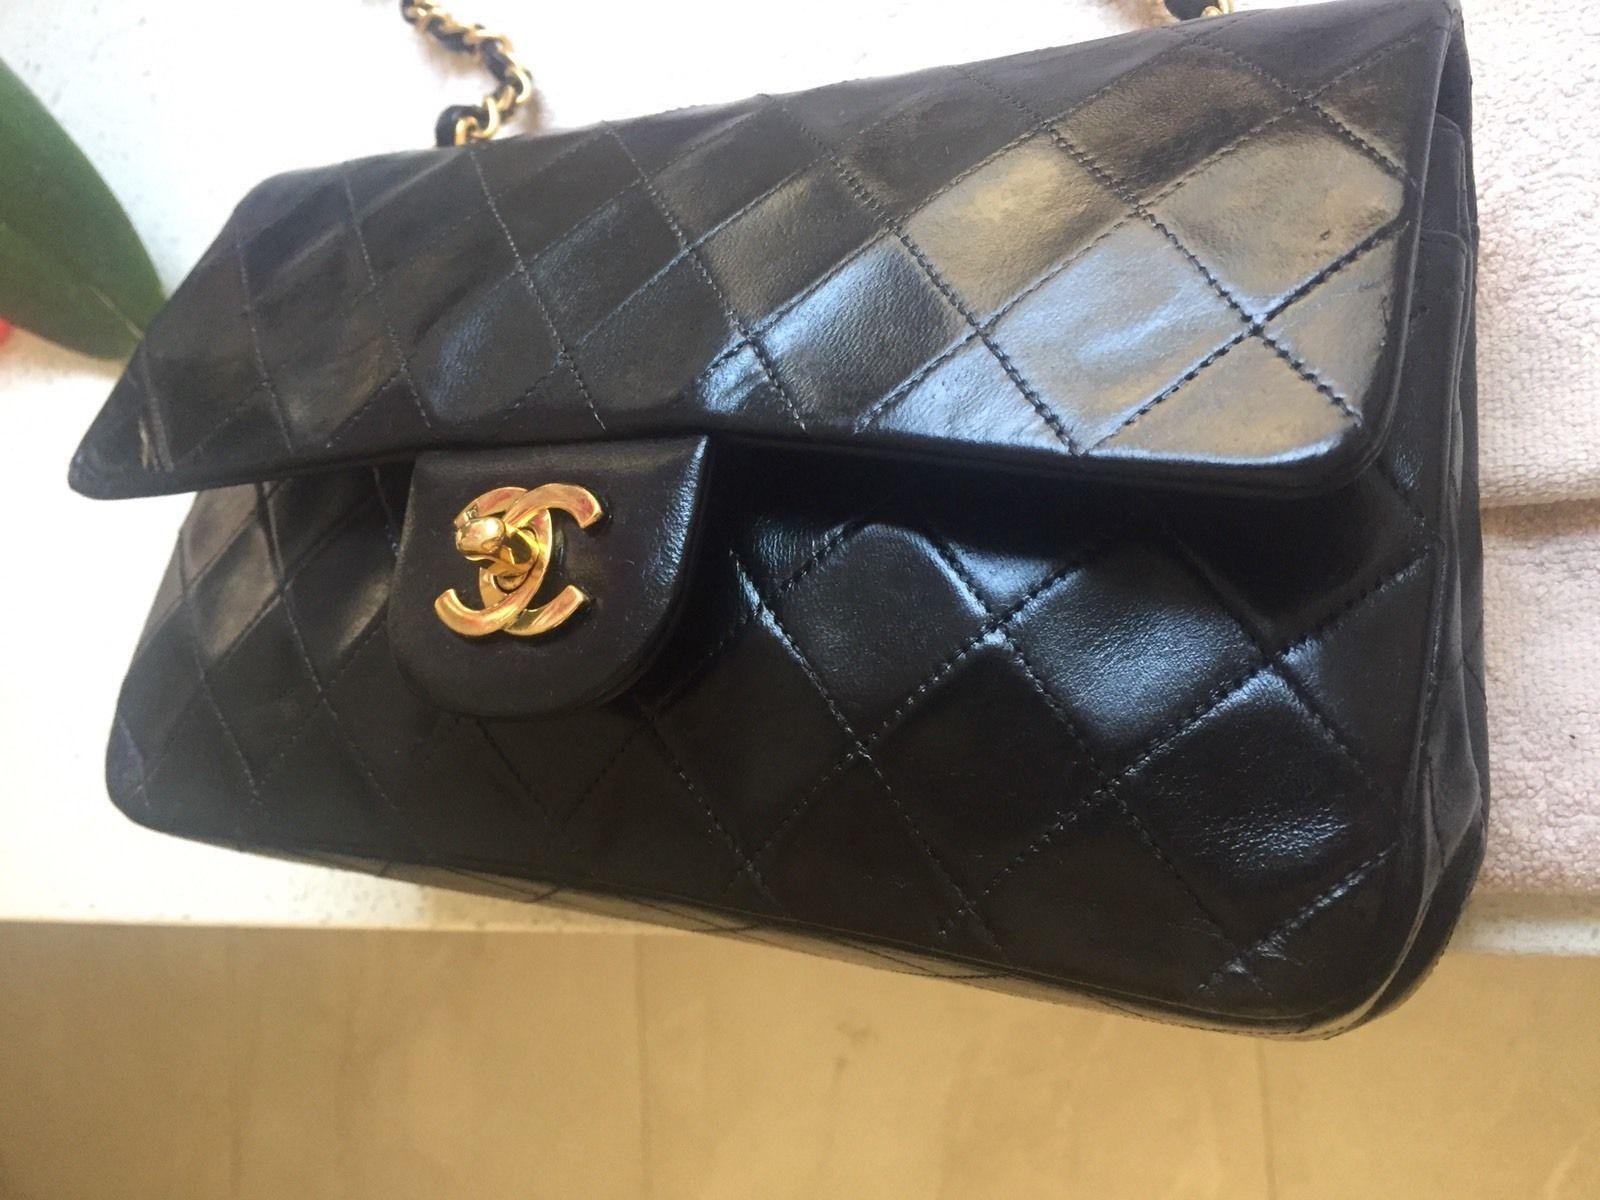 Chanel Classic Medium Double Flap Lambskin Black https://t.co/3ol5NISbUm https://t.co/ypXlUTv6lx